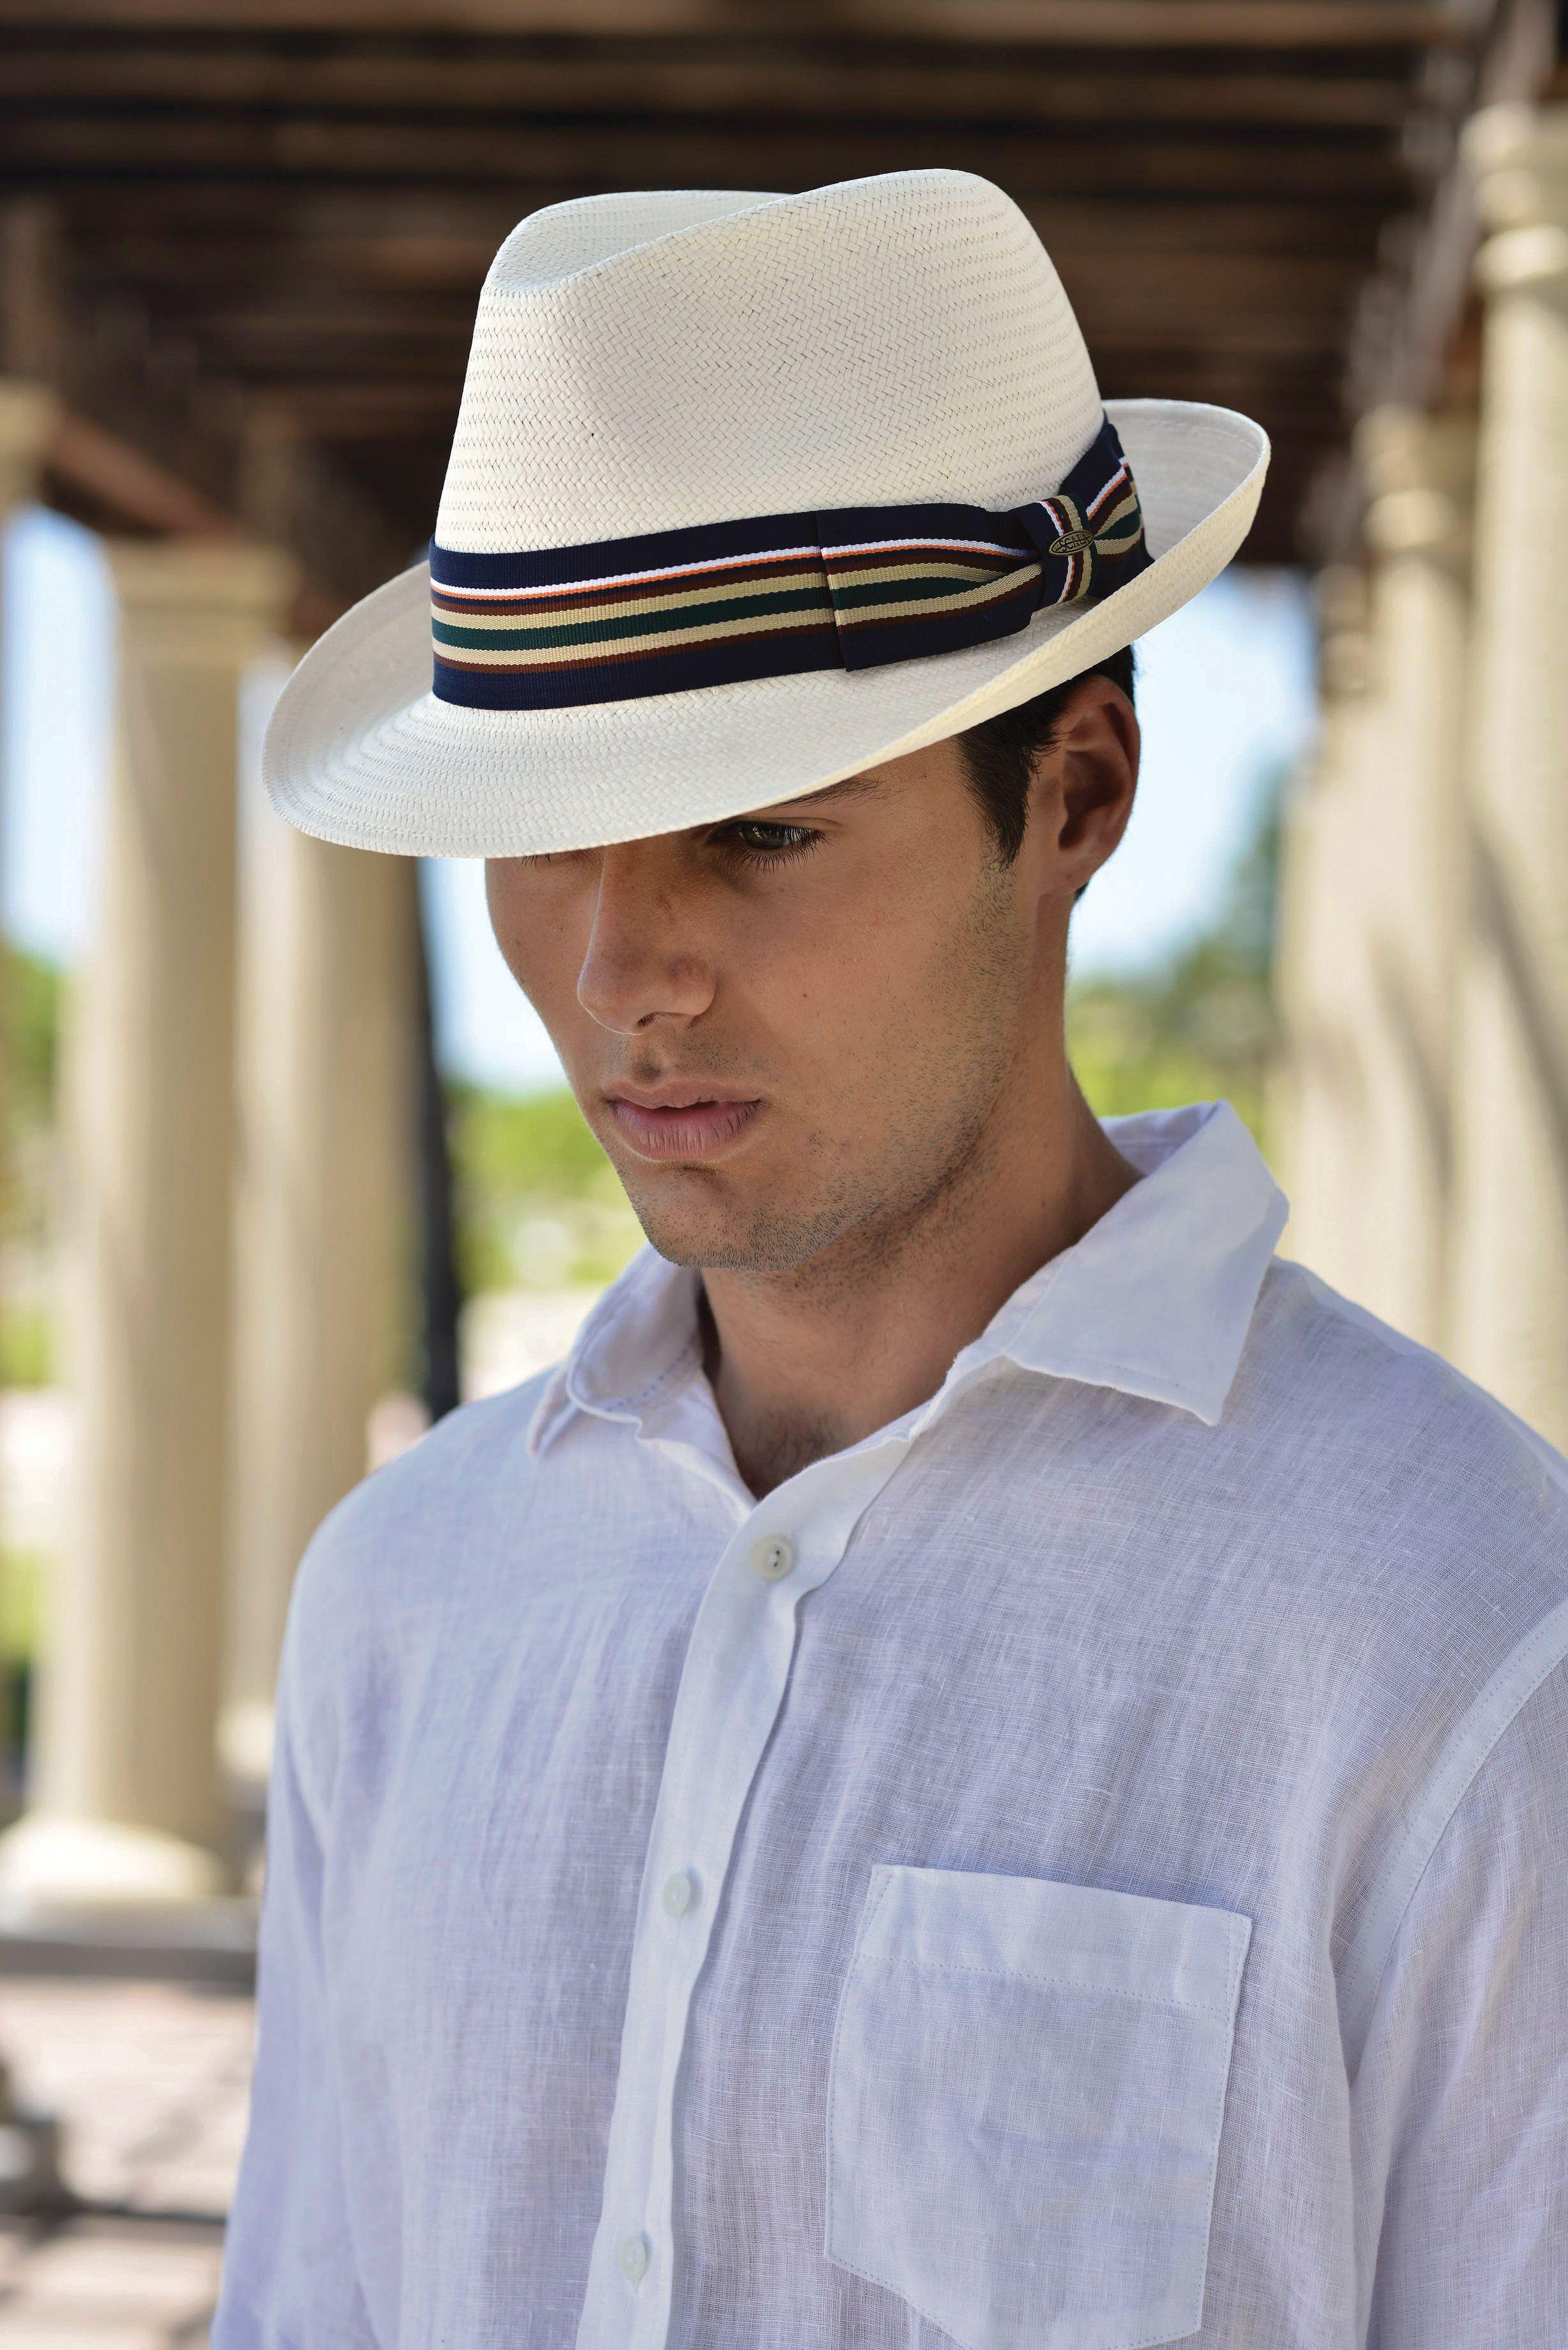 d4974124 Men's fashion toyo fedora hat. Classic straw hat. Scala | Men's ...